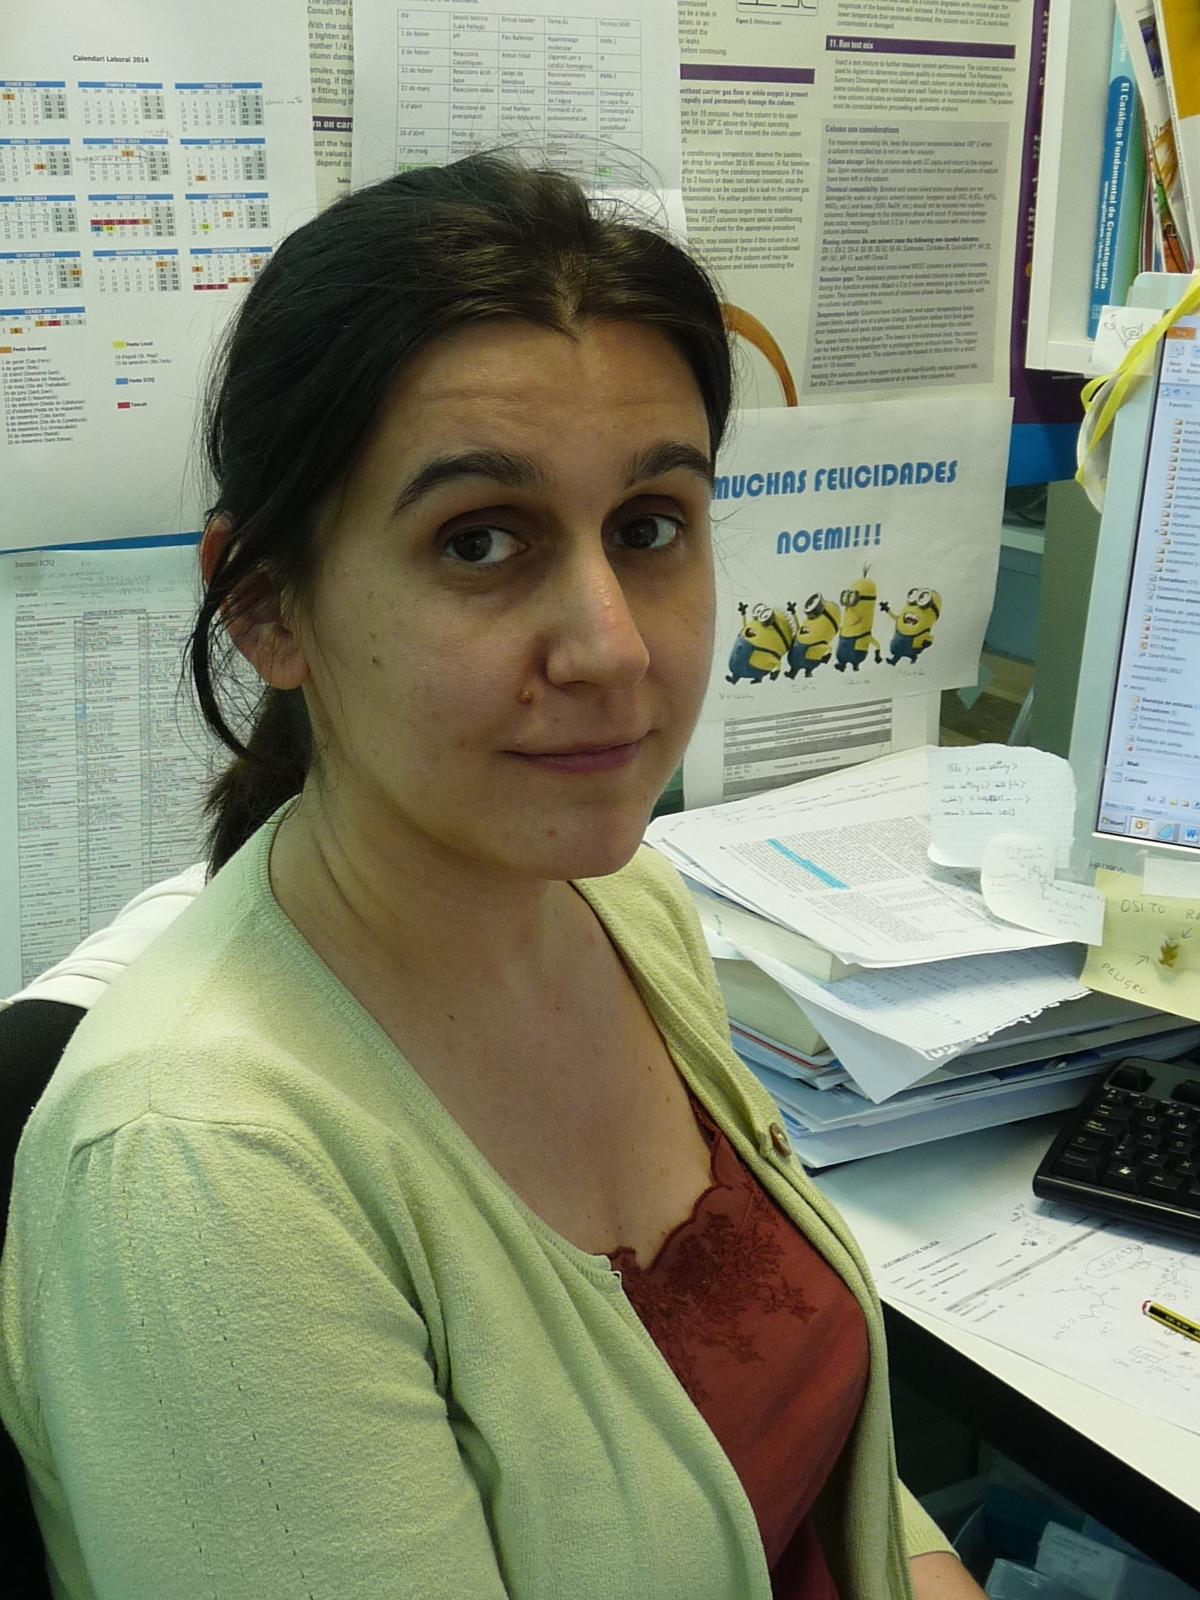 Noemi Cabello